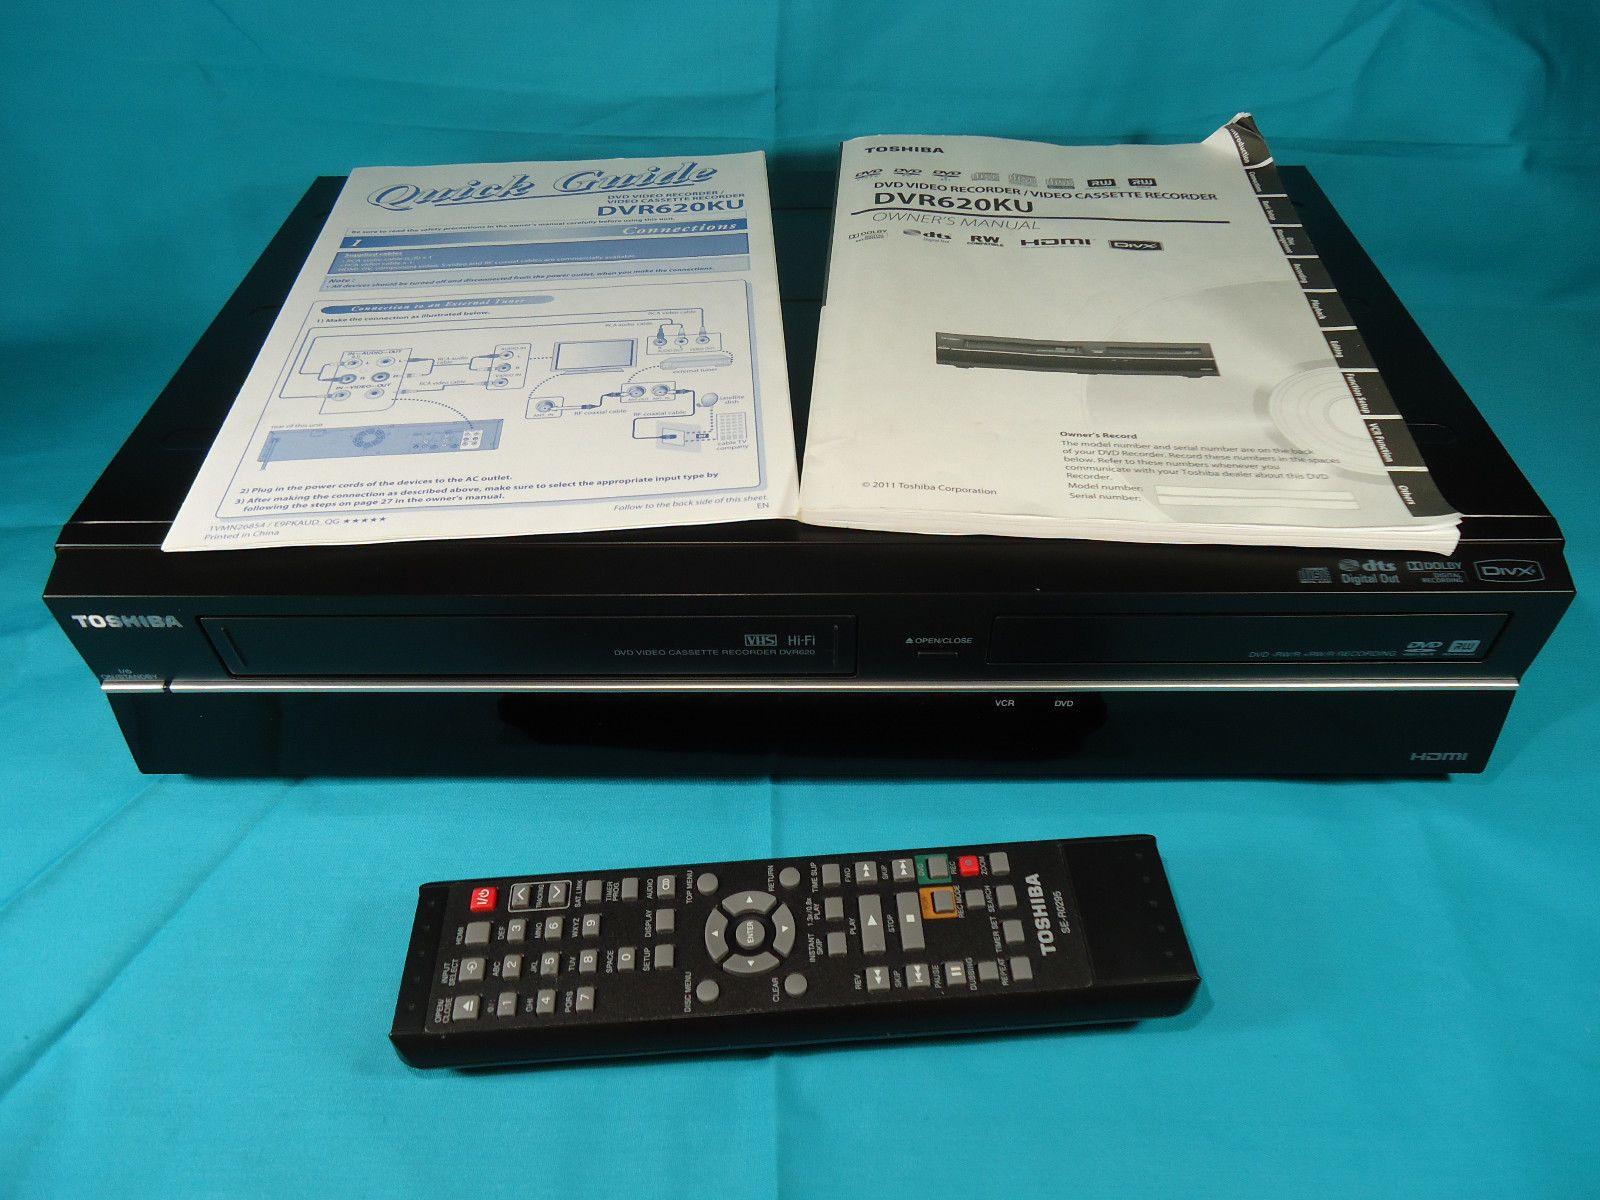 toshiba dvr620 dvd vhs recorder 2 way dubbing w remote manual rh pinterest co uk toshiba dvr620 manual download toshiba dvr620 manual pdf